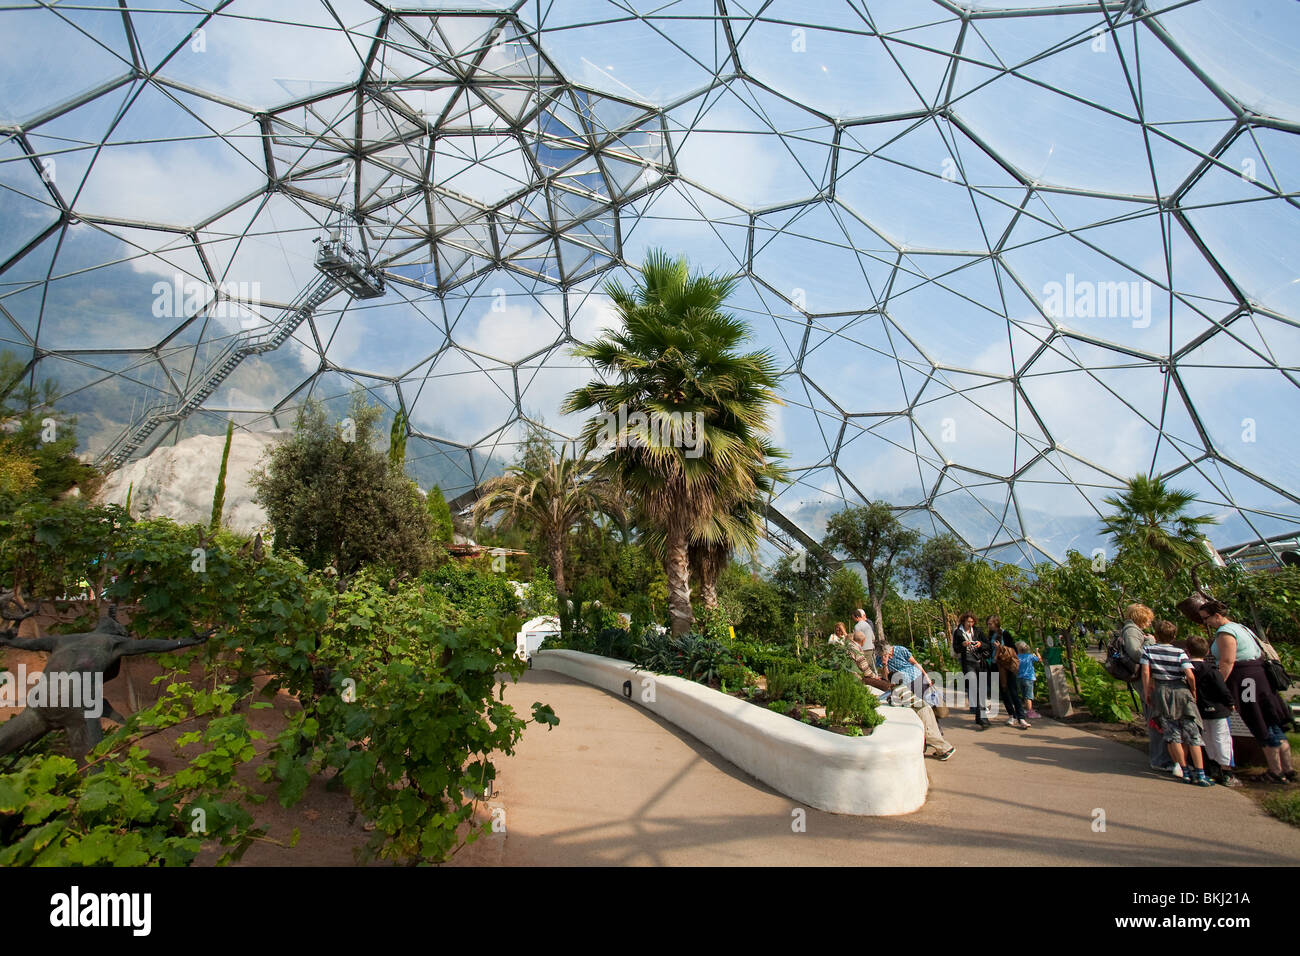 Interior Mediterranean Biome Eden Project Stockfotos & Interior ...